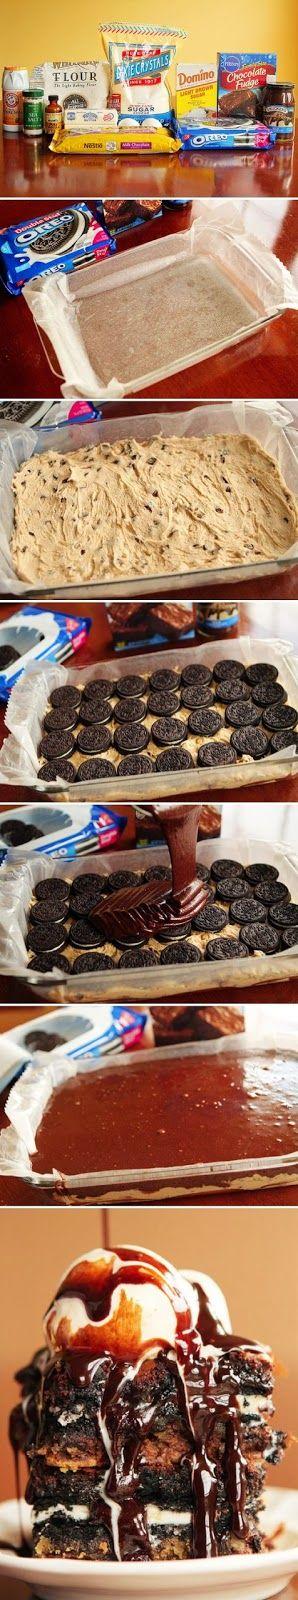 The Best Cookie Fudge Brownie Bars Ever ❤ • #recipes • #chocolate • #cockies • #tutorial • #icecream • #brownies • #desserts